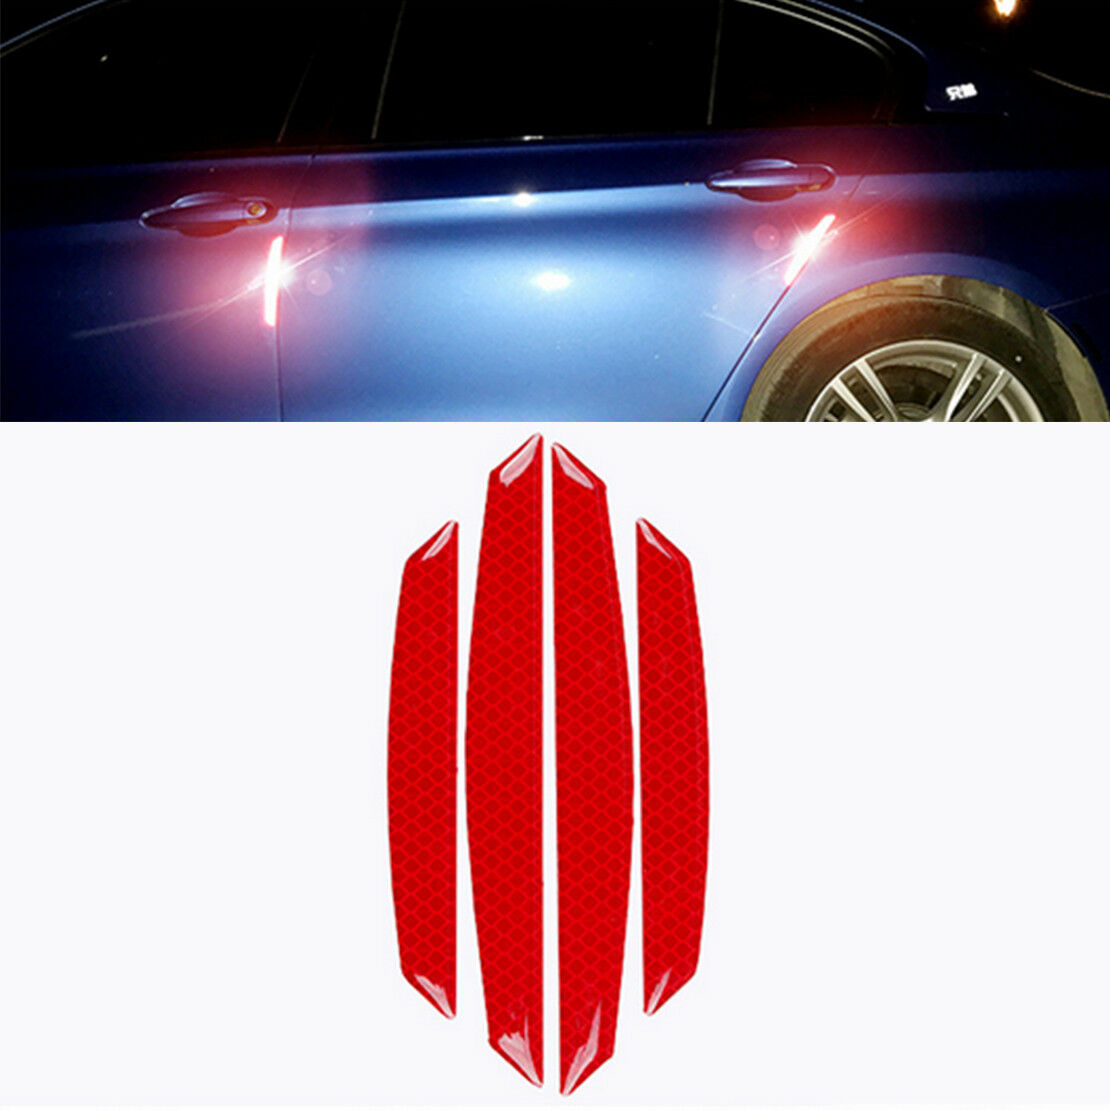 4x Car Door Edge Guard Scratch Protector Anti-collision Trim Stickers For Mazda